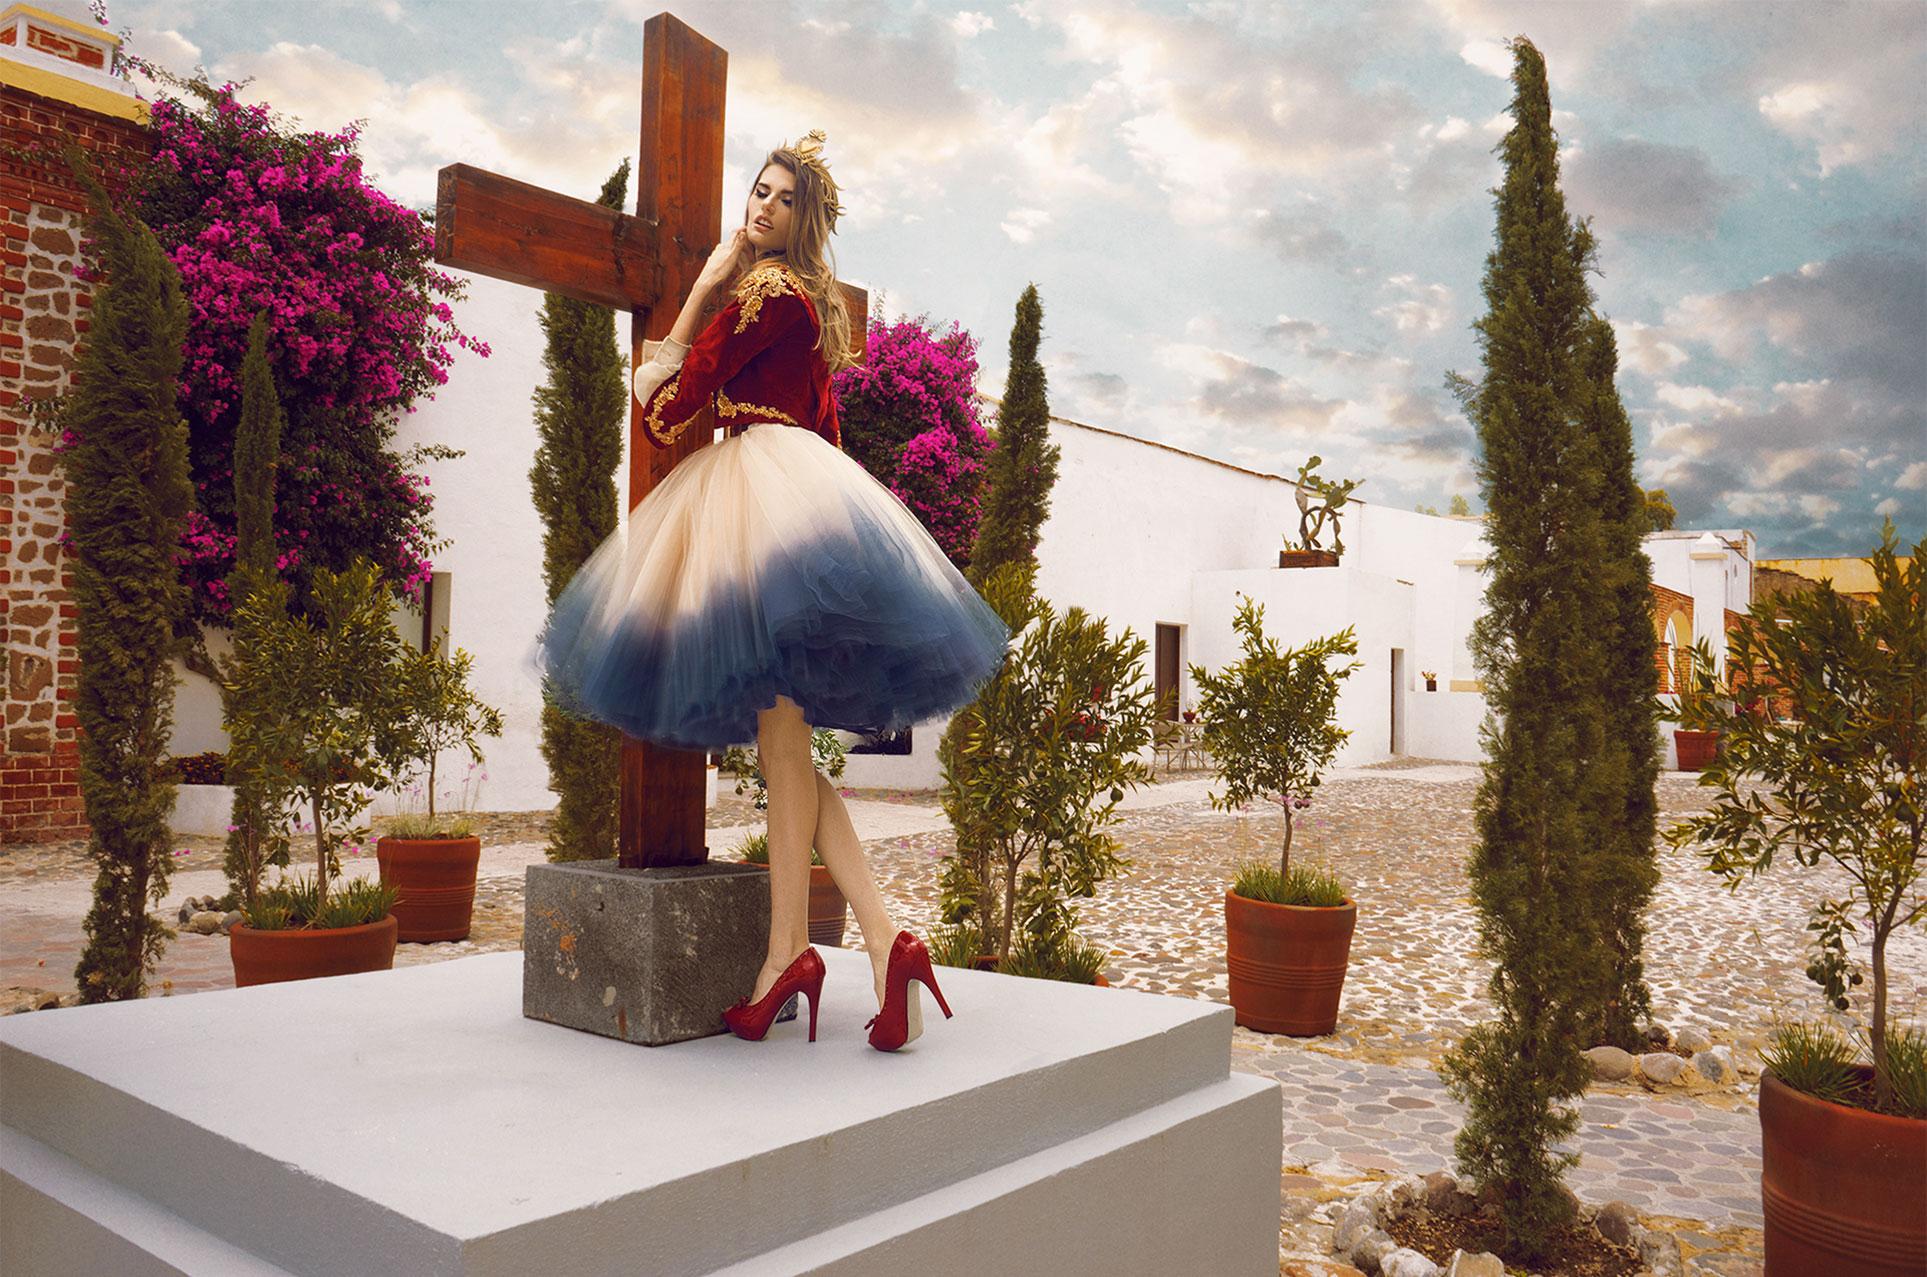 The Forgotten Kingdom / Antonela Sabate by Jvdas Berra